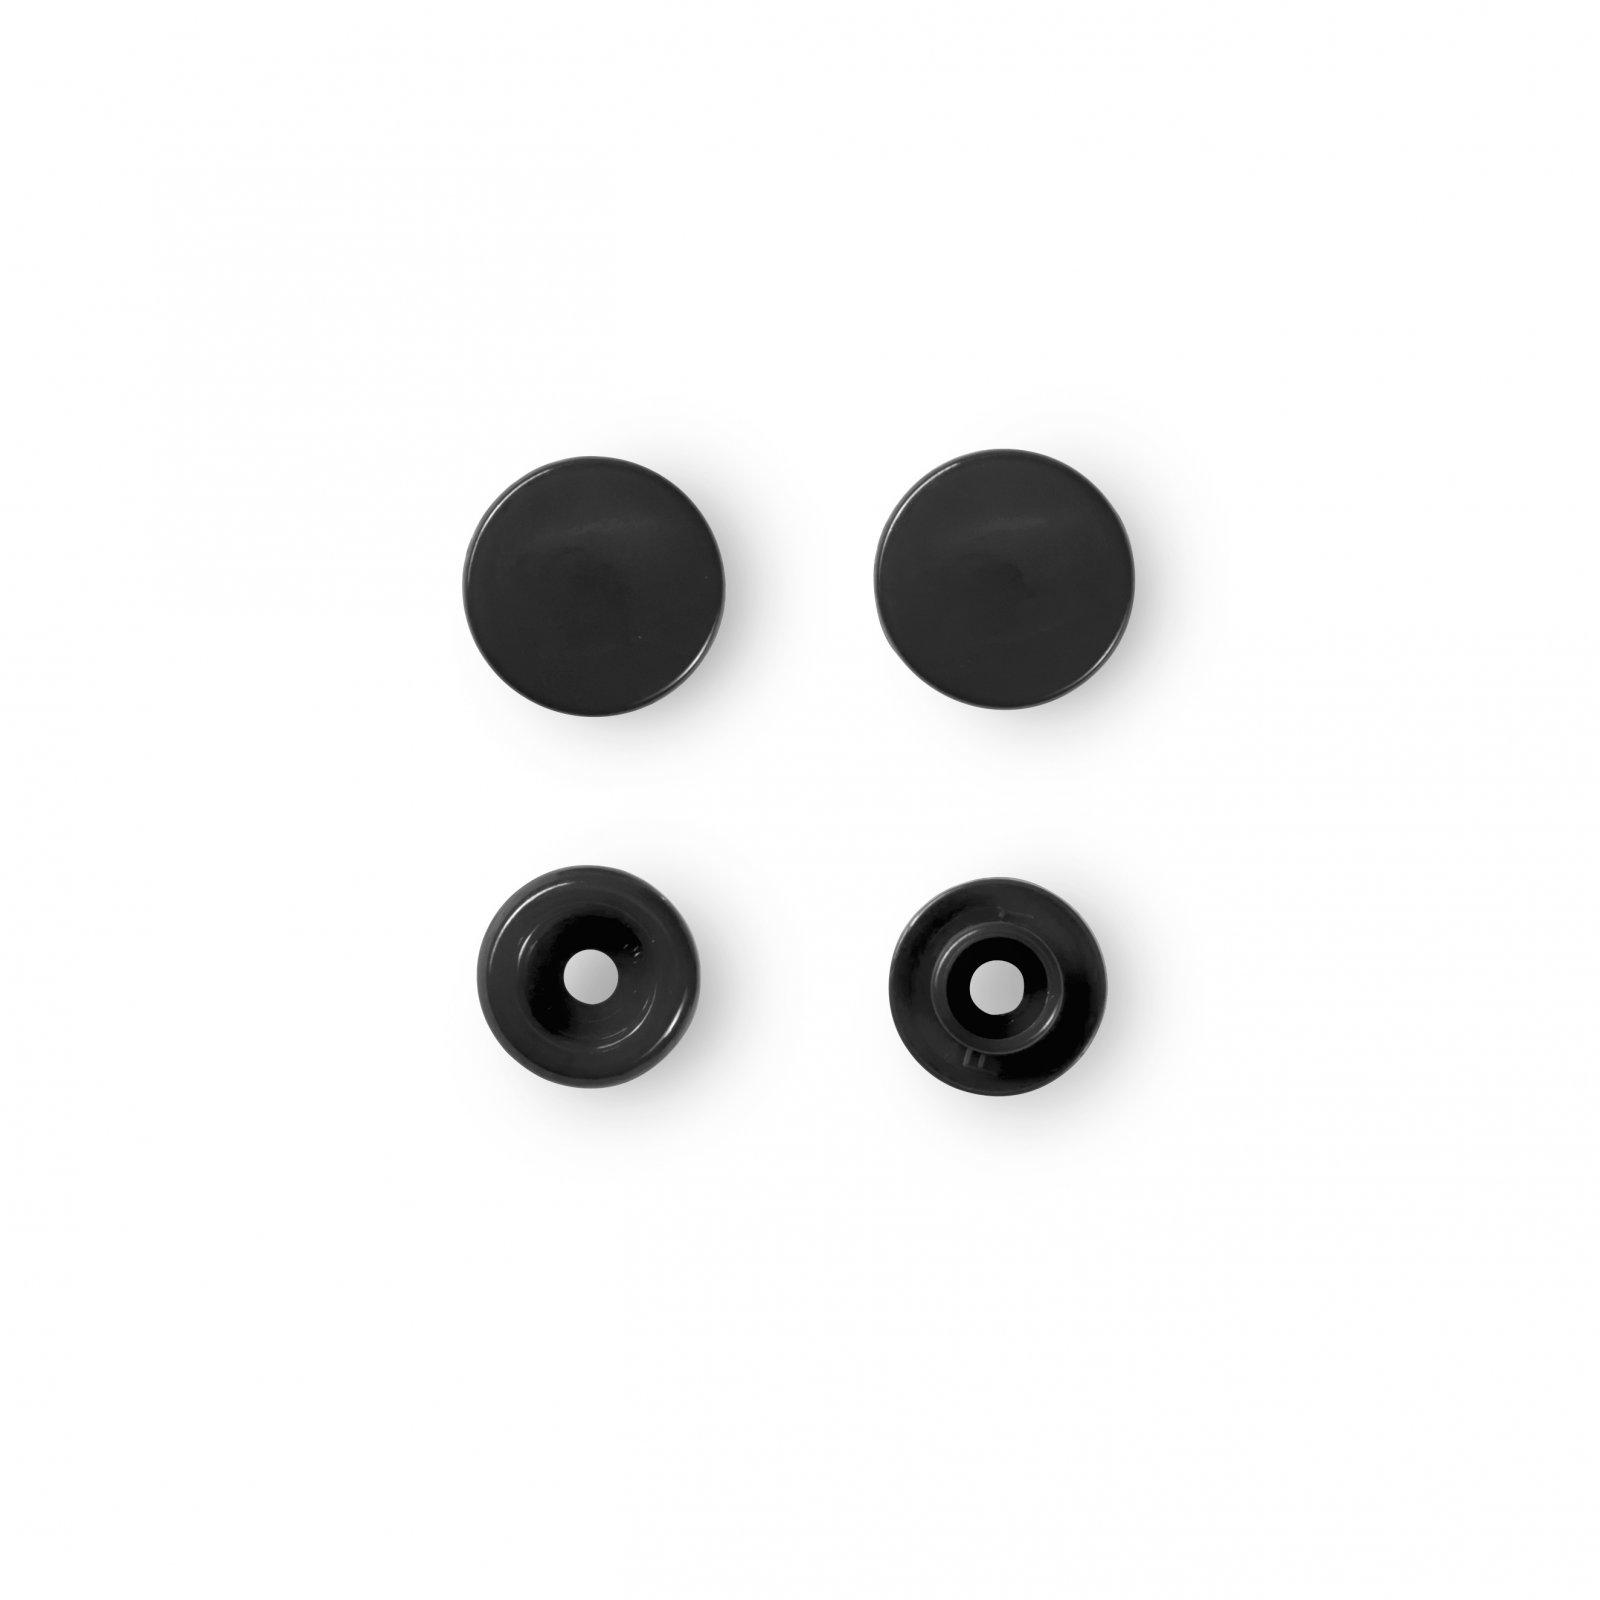 Prym Colour Snaps in Black - 12.4mm (30 Sets)